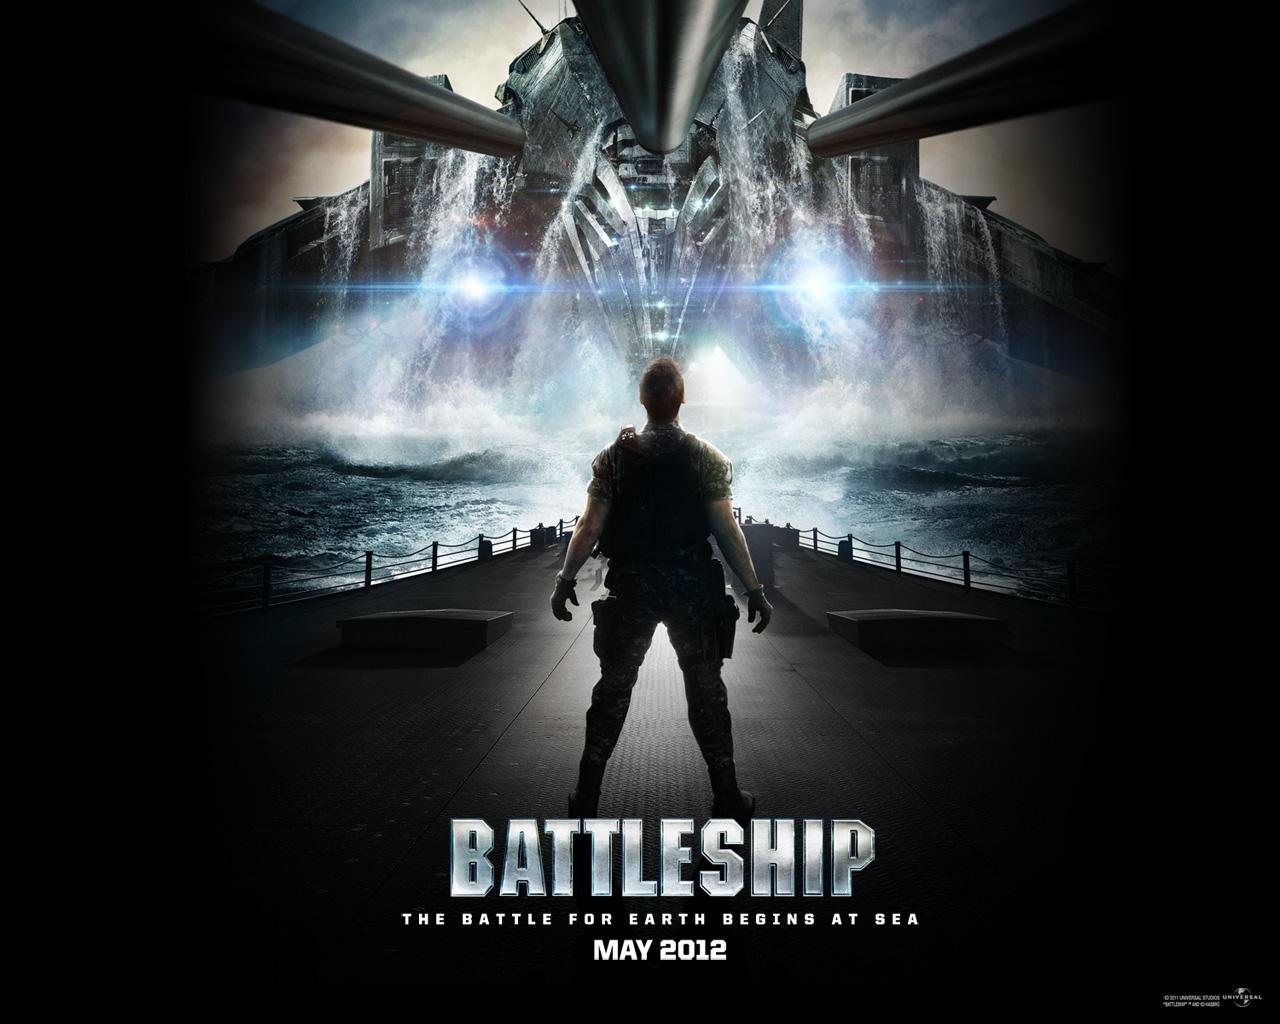 http://3.bp.blogspot.com/-0zUzwokyB3Y/T5nAnarGRmI/AAAAAAAAah8/Z7uy3g6fphs/s1600/battleship_2_1280x1024.jpg